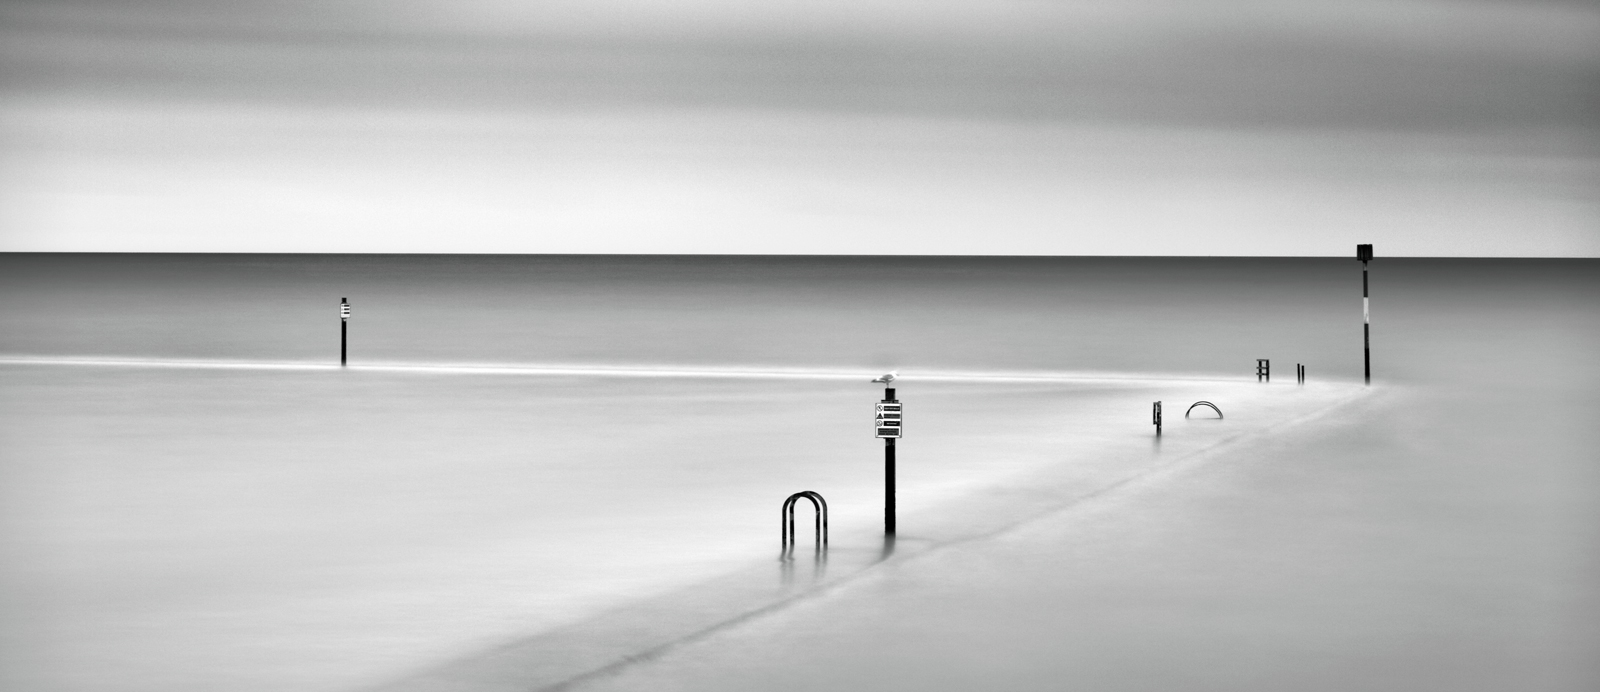 0565-Margate-tidal-pool-2